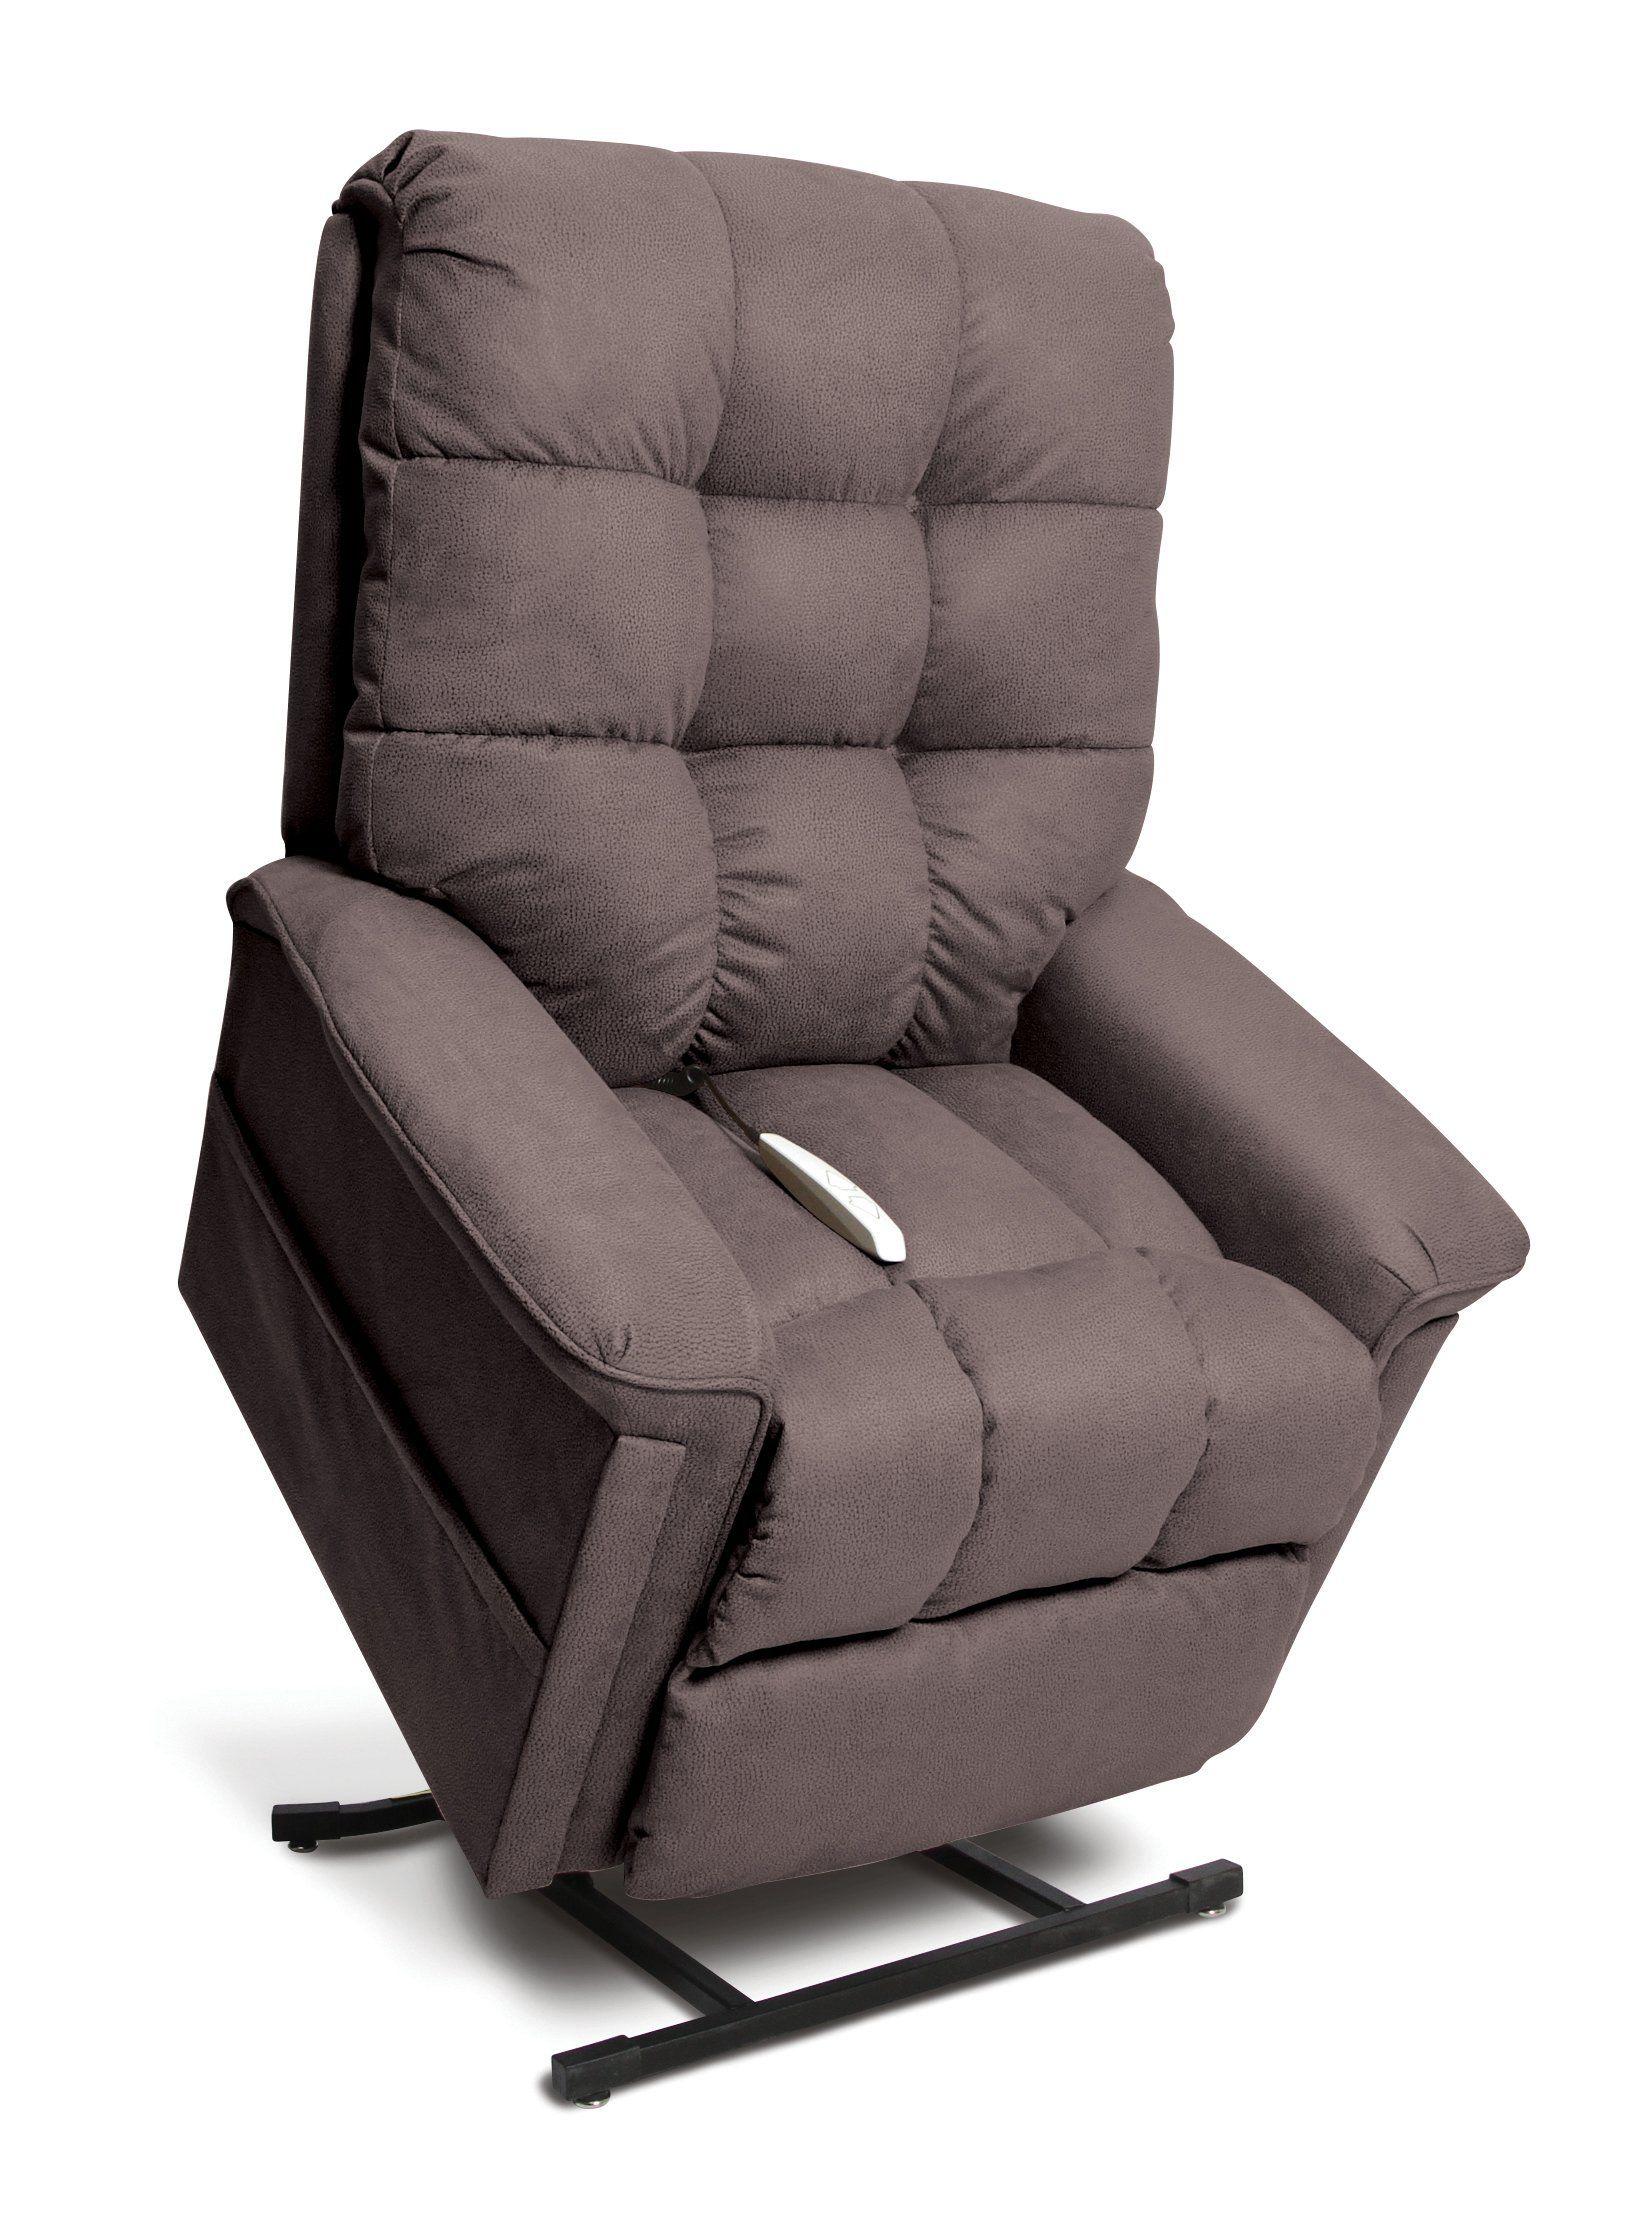 Casual Contemporary Mink Brown 3 Position Lift Chair – Nebraska